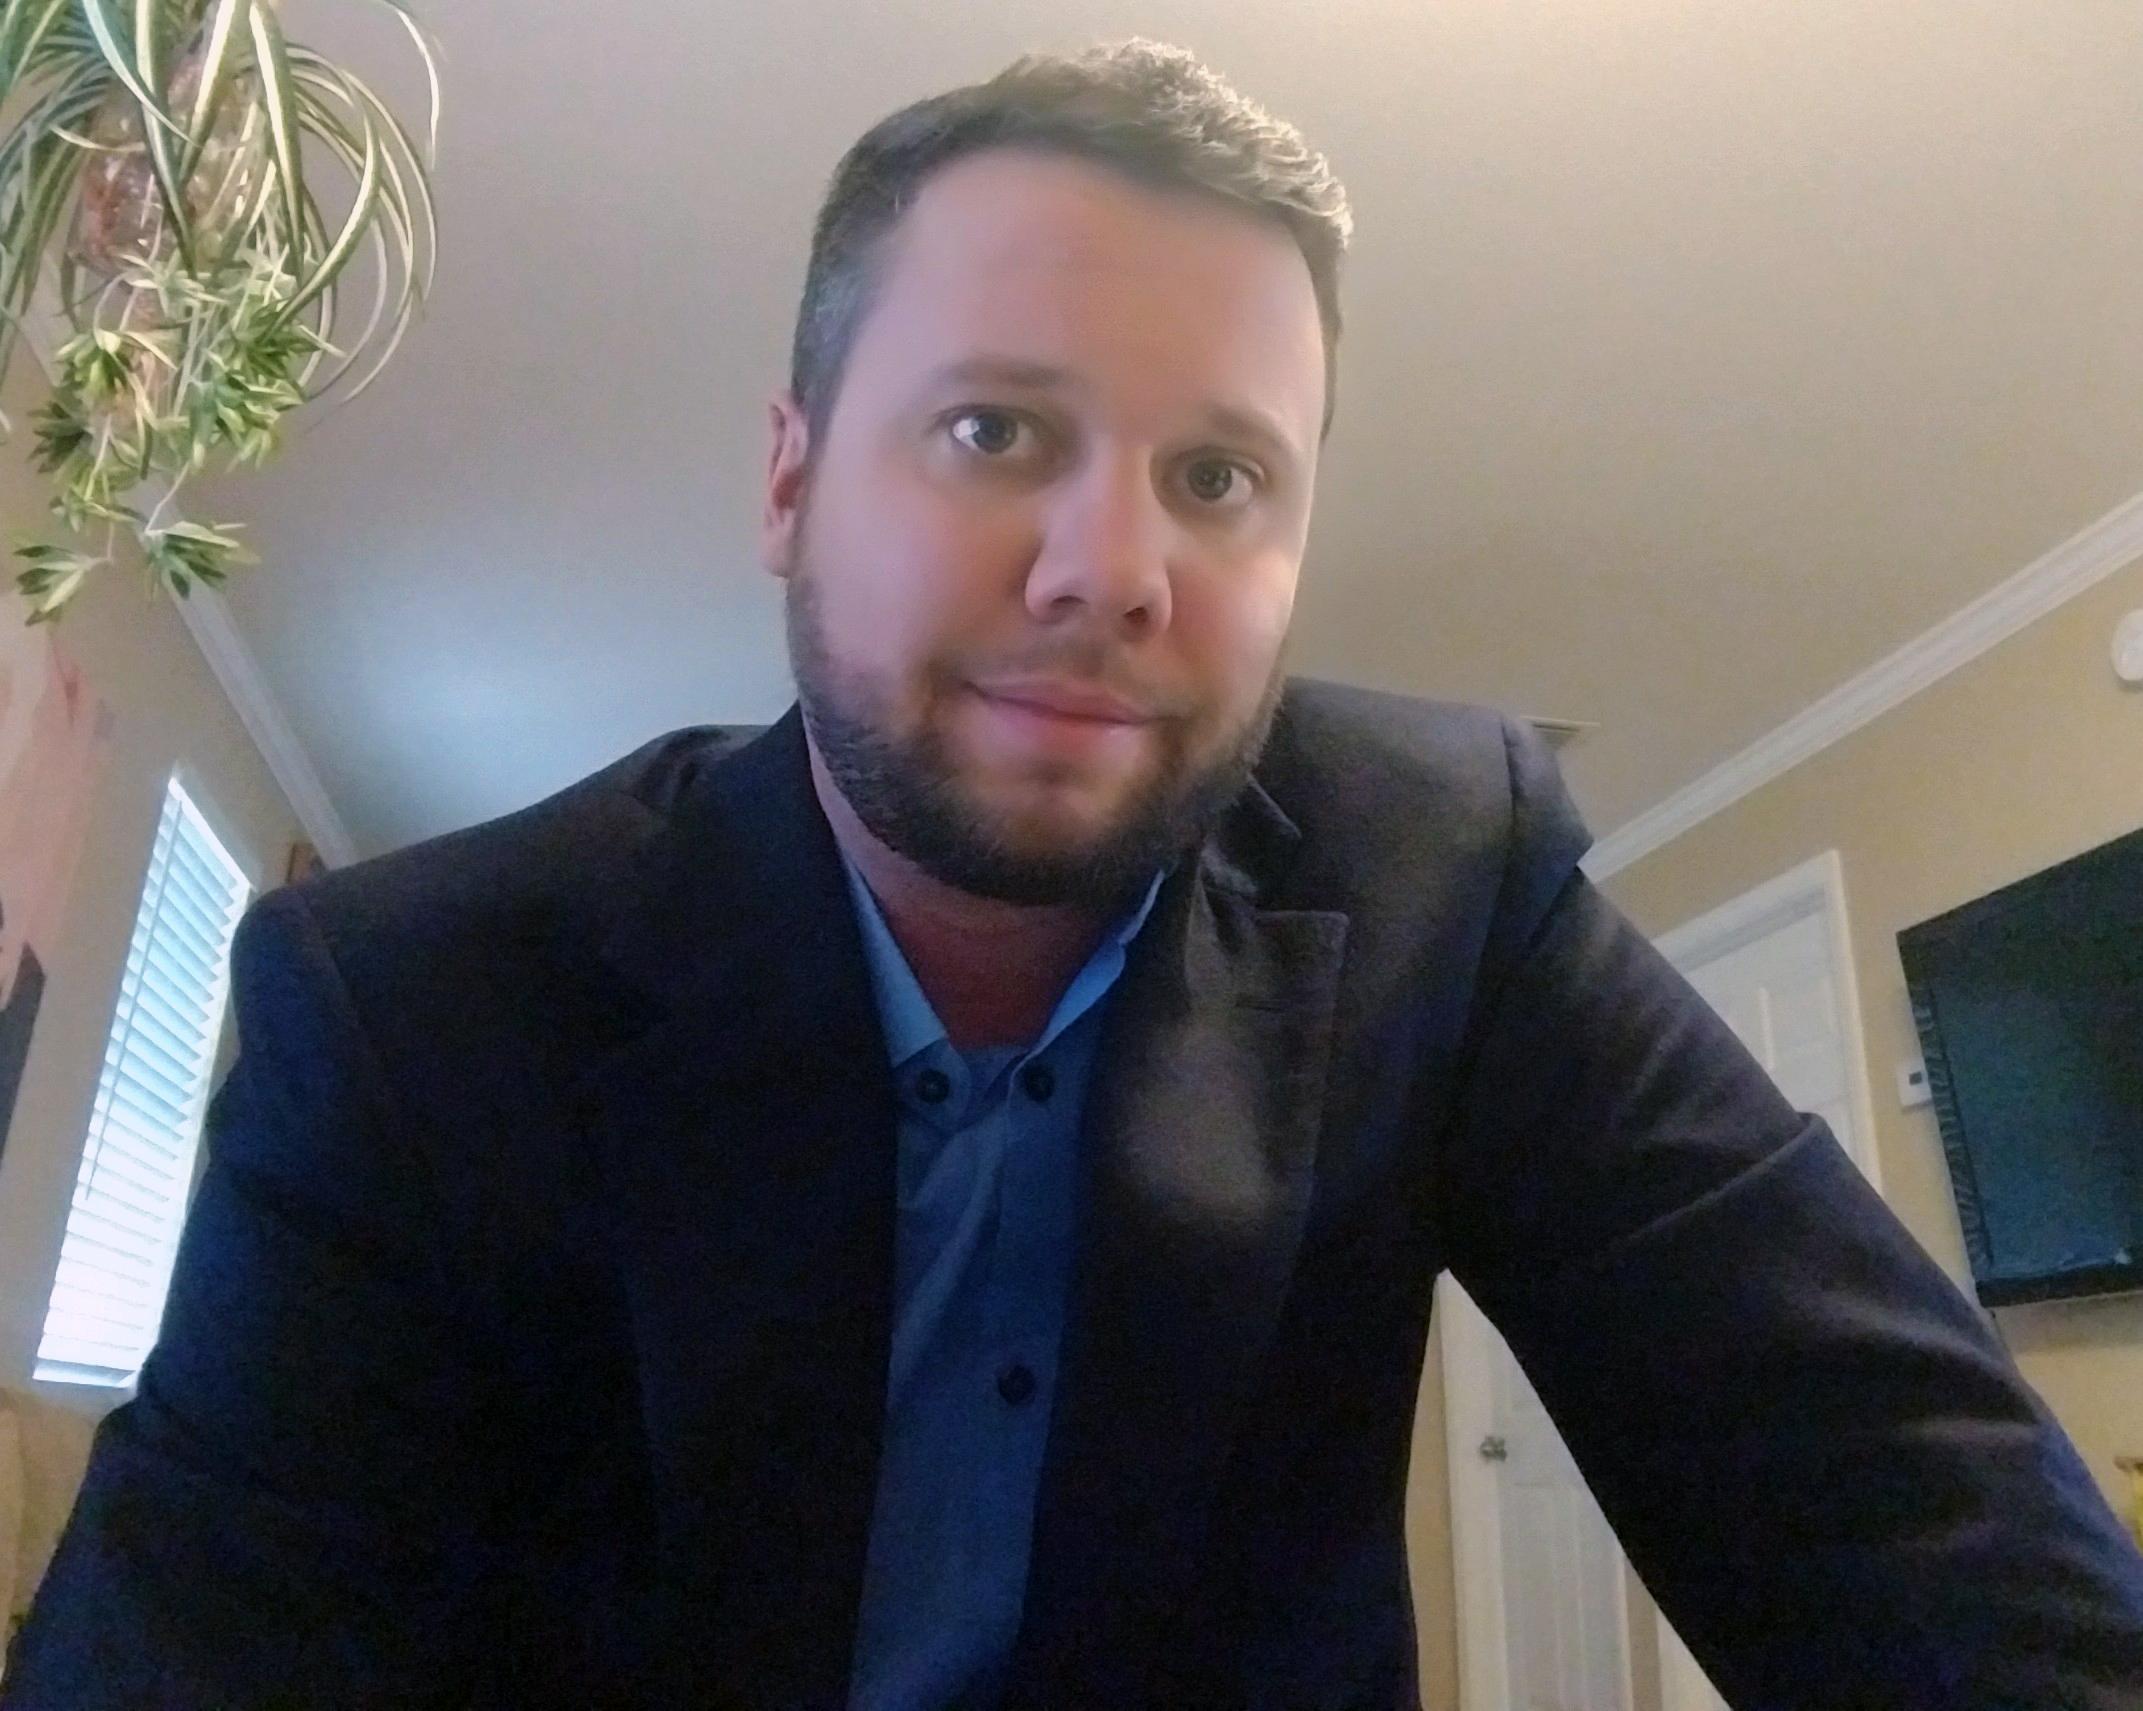 Wes Kirkland, Operations Manager for Inuktun InCommand Robotics, LLC